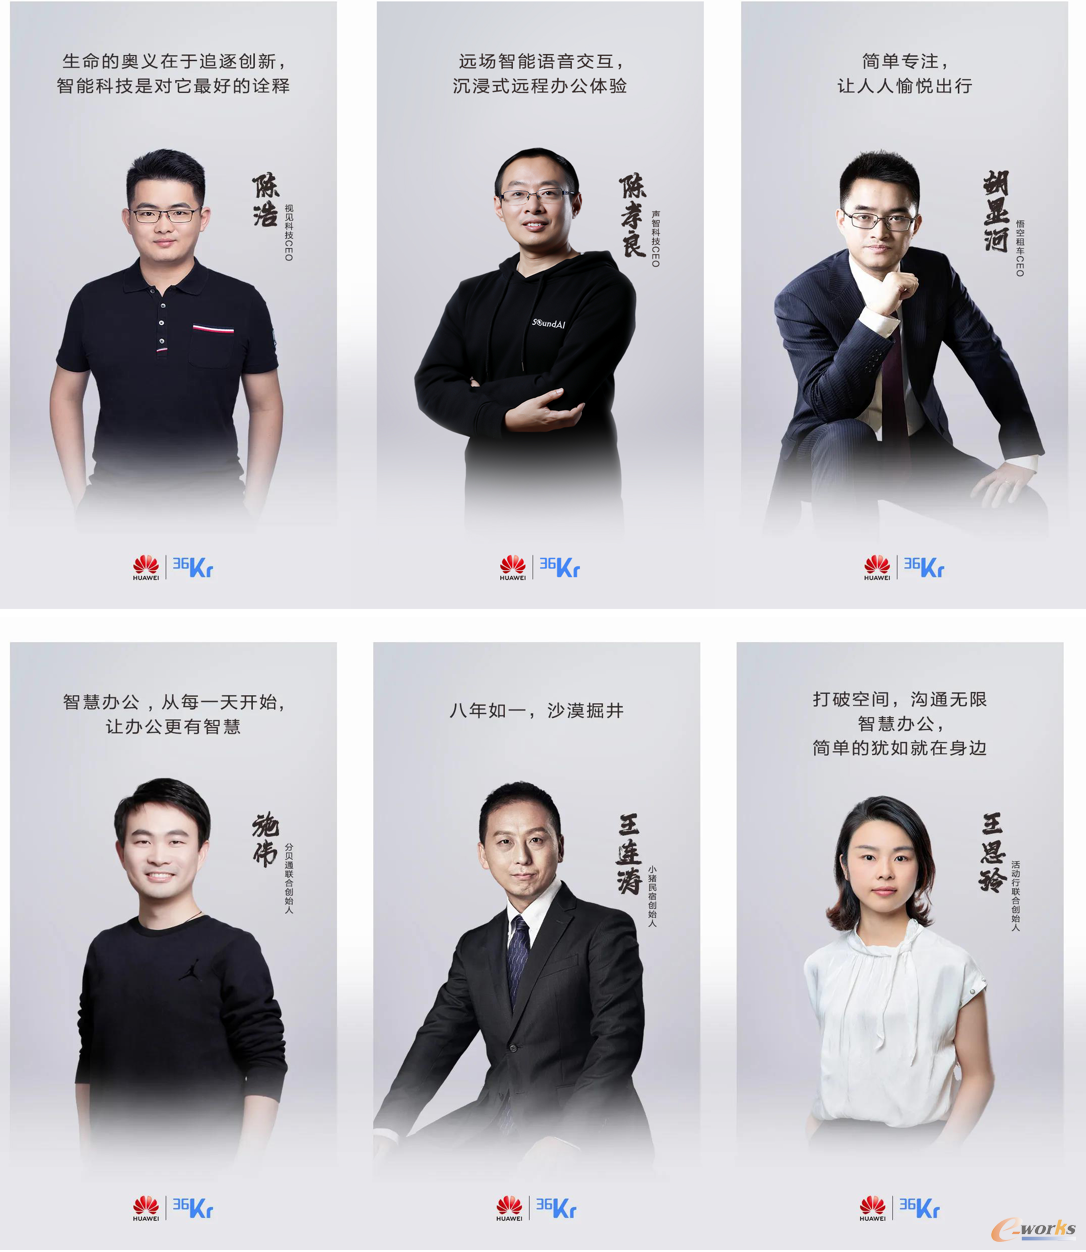 http://www.e-works.net.cn/News/articleimage/20208/132423013618313473_new.png